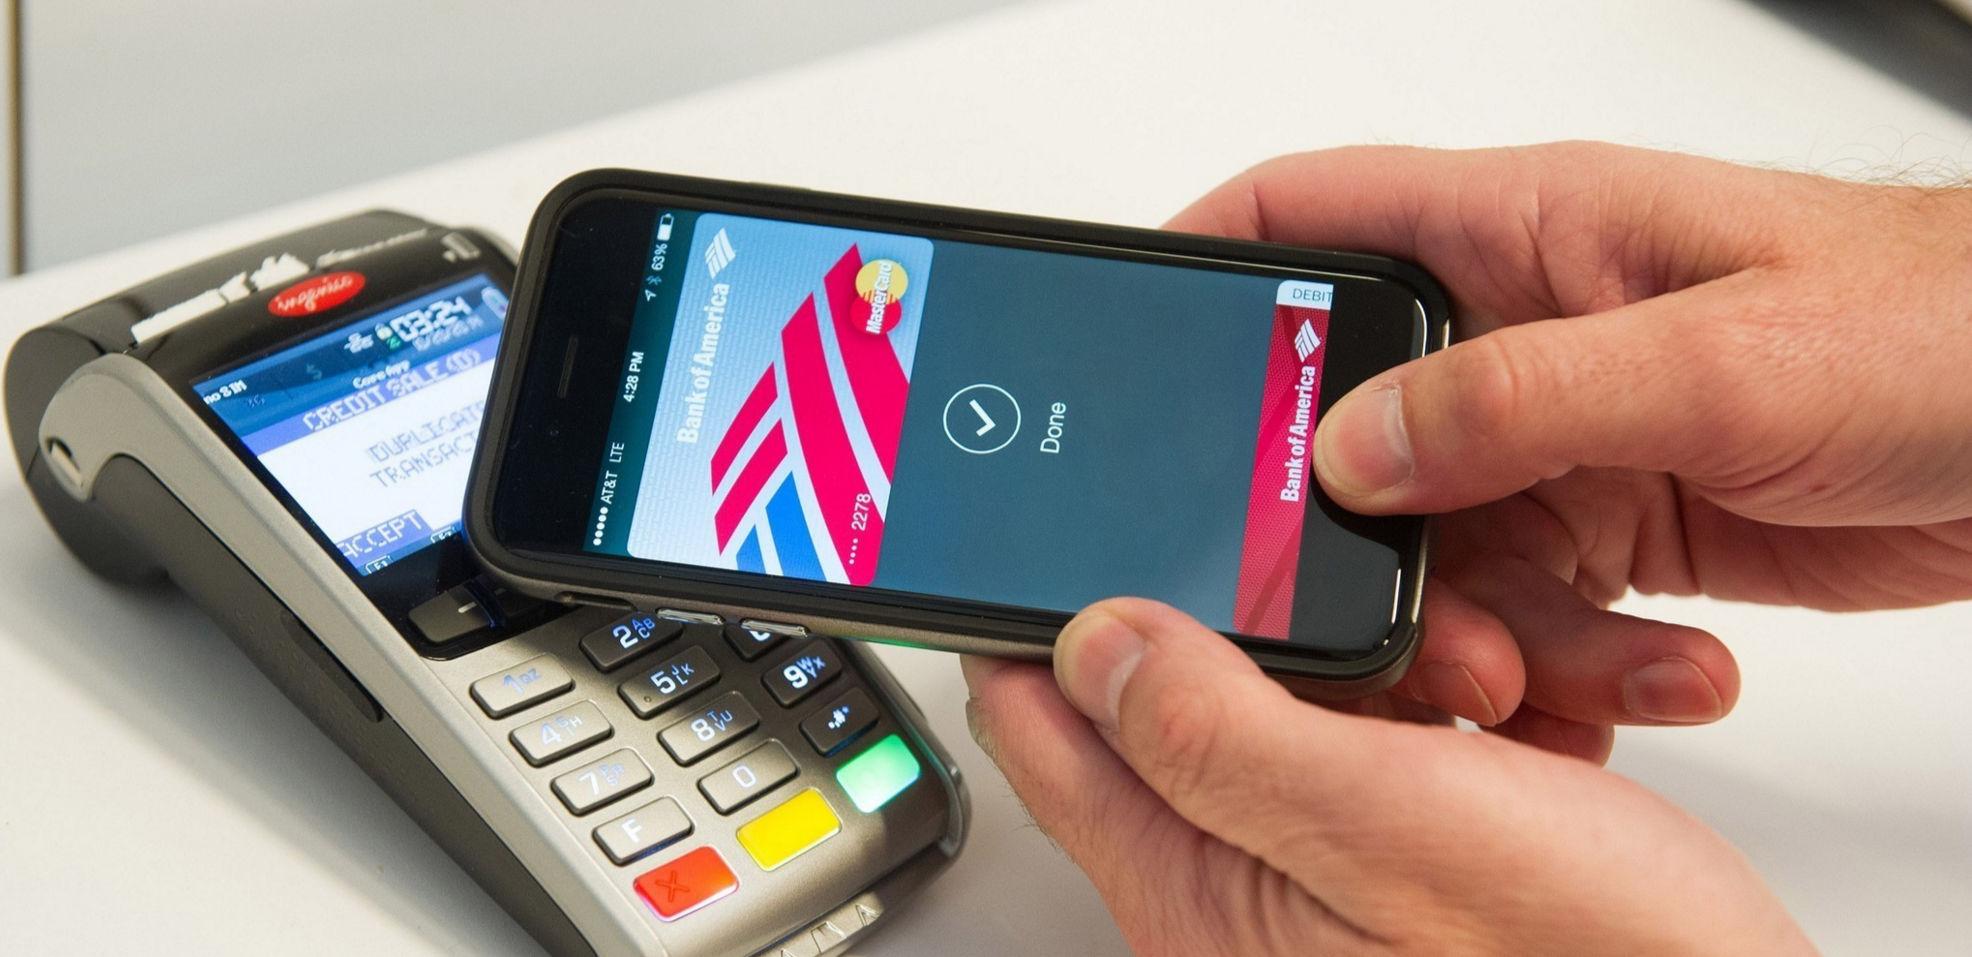 Apple Pay 测试成功,马上就能「刷 iPhone」购物了!